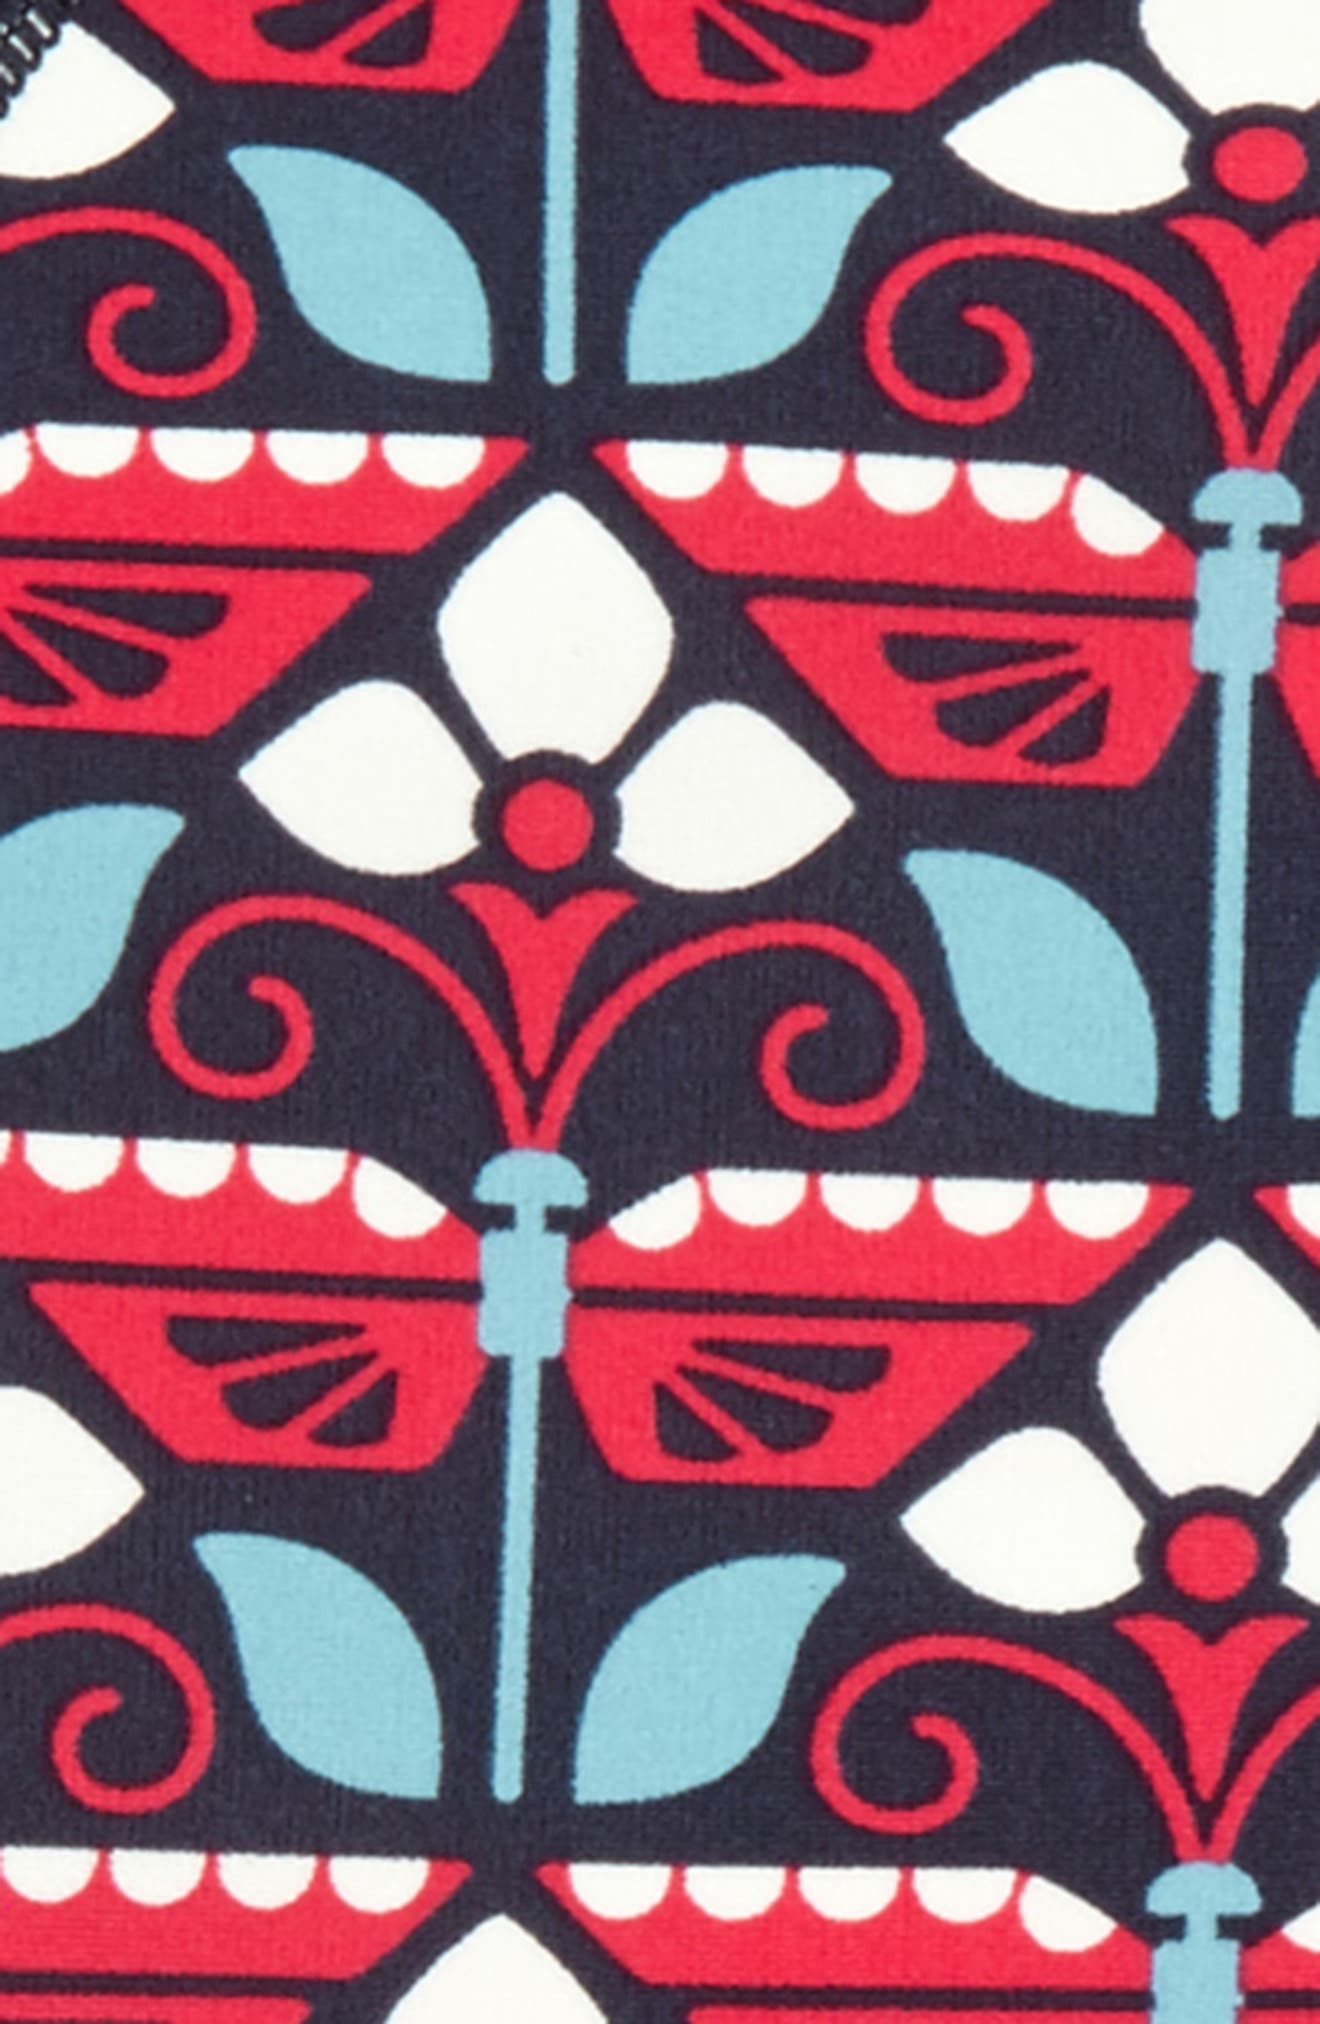 Kaleidoscope Two-Piece Rashguard Swimsuit,                             Alternate thumbnail 2, color,